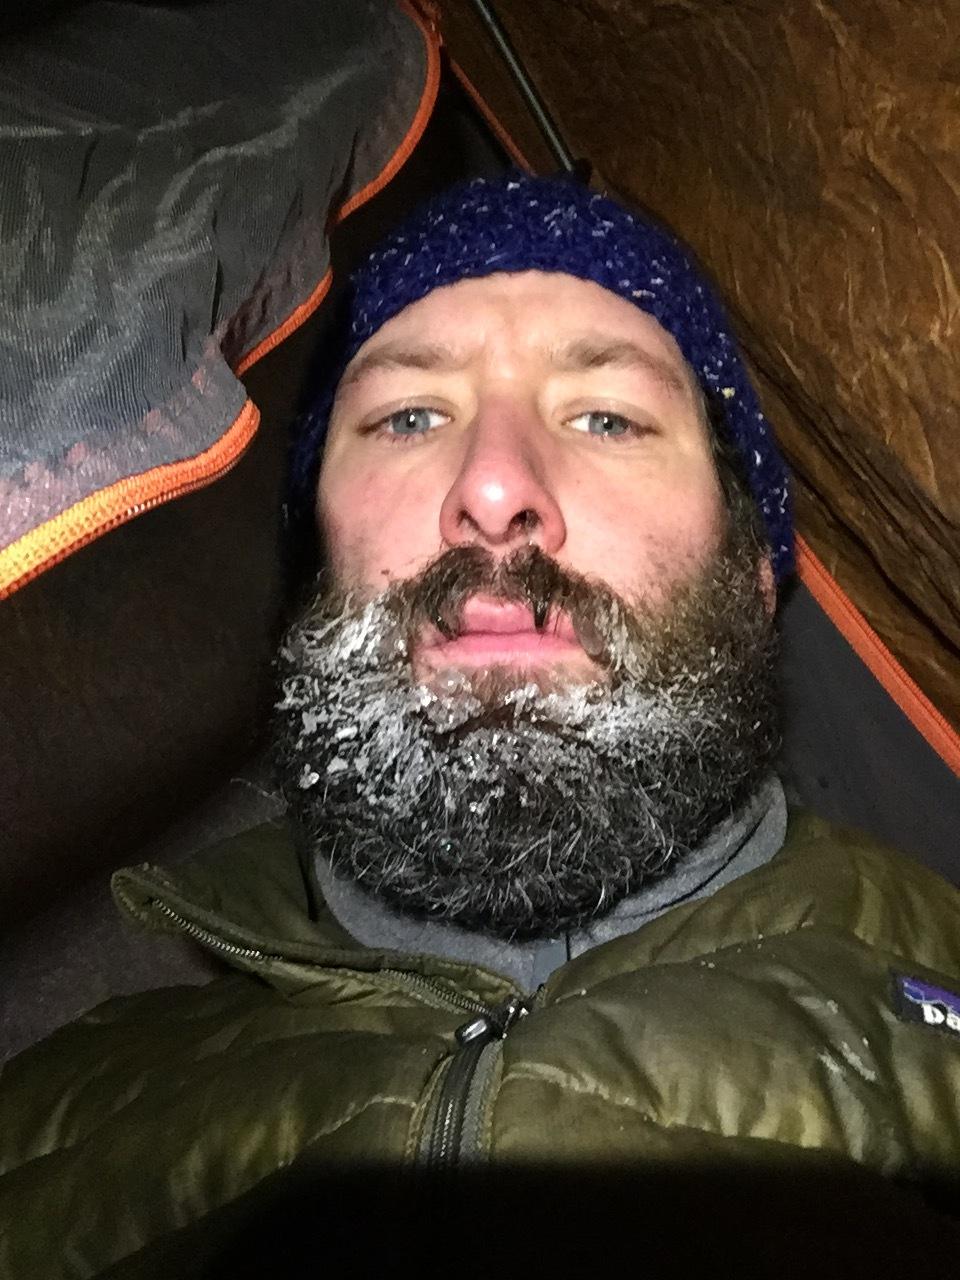 Not a happy camper face.